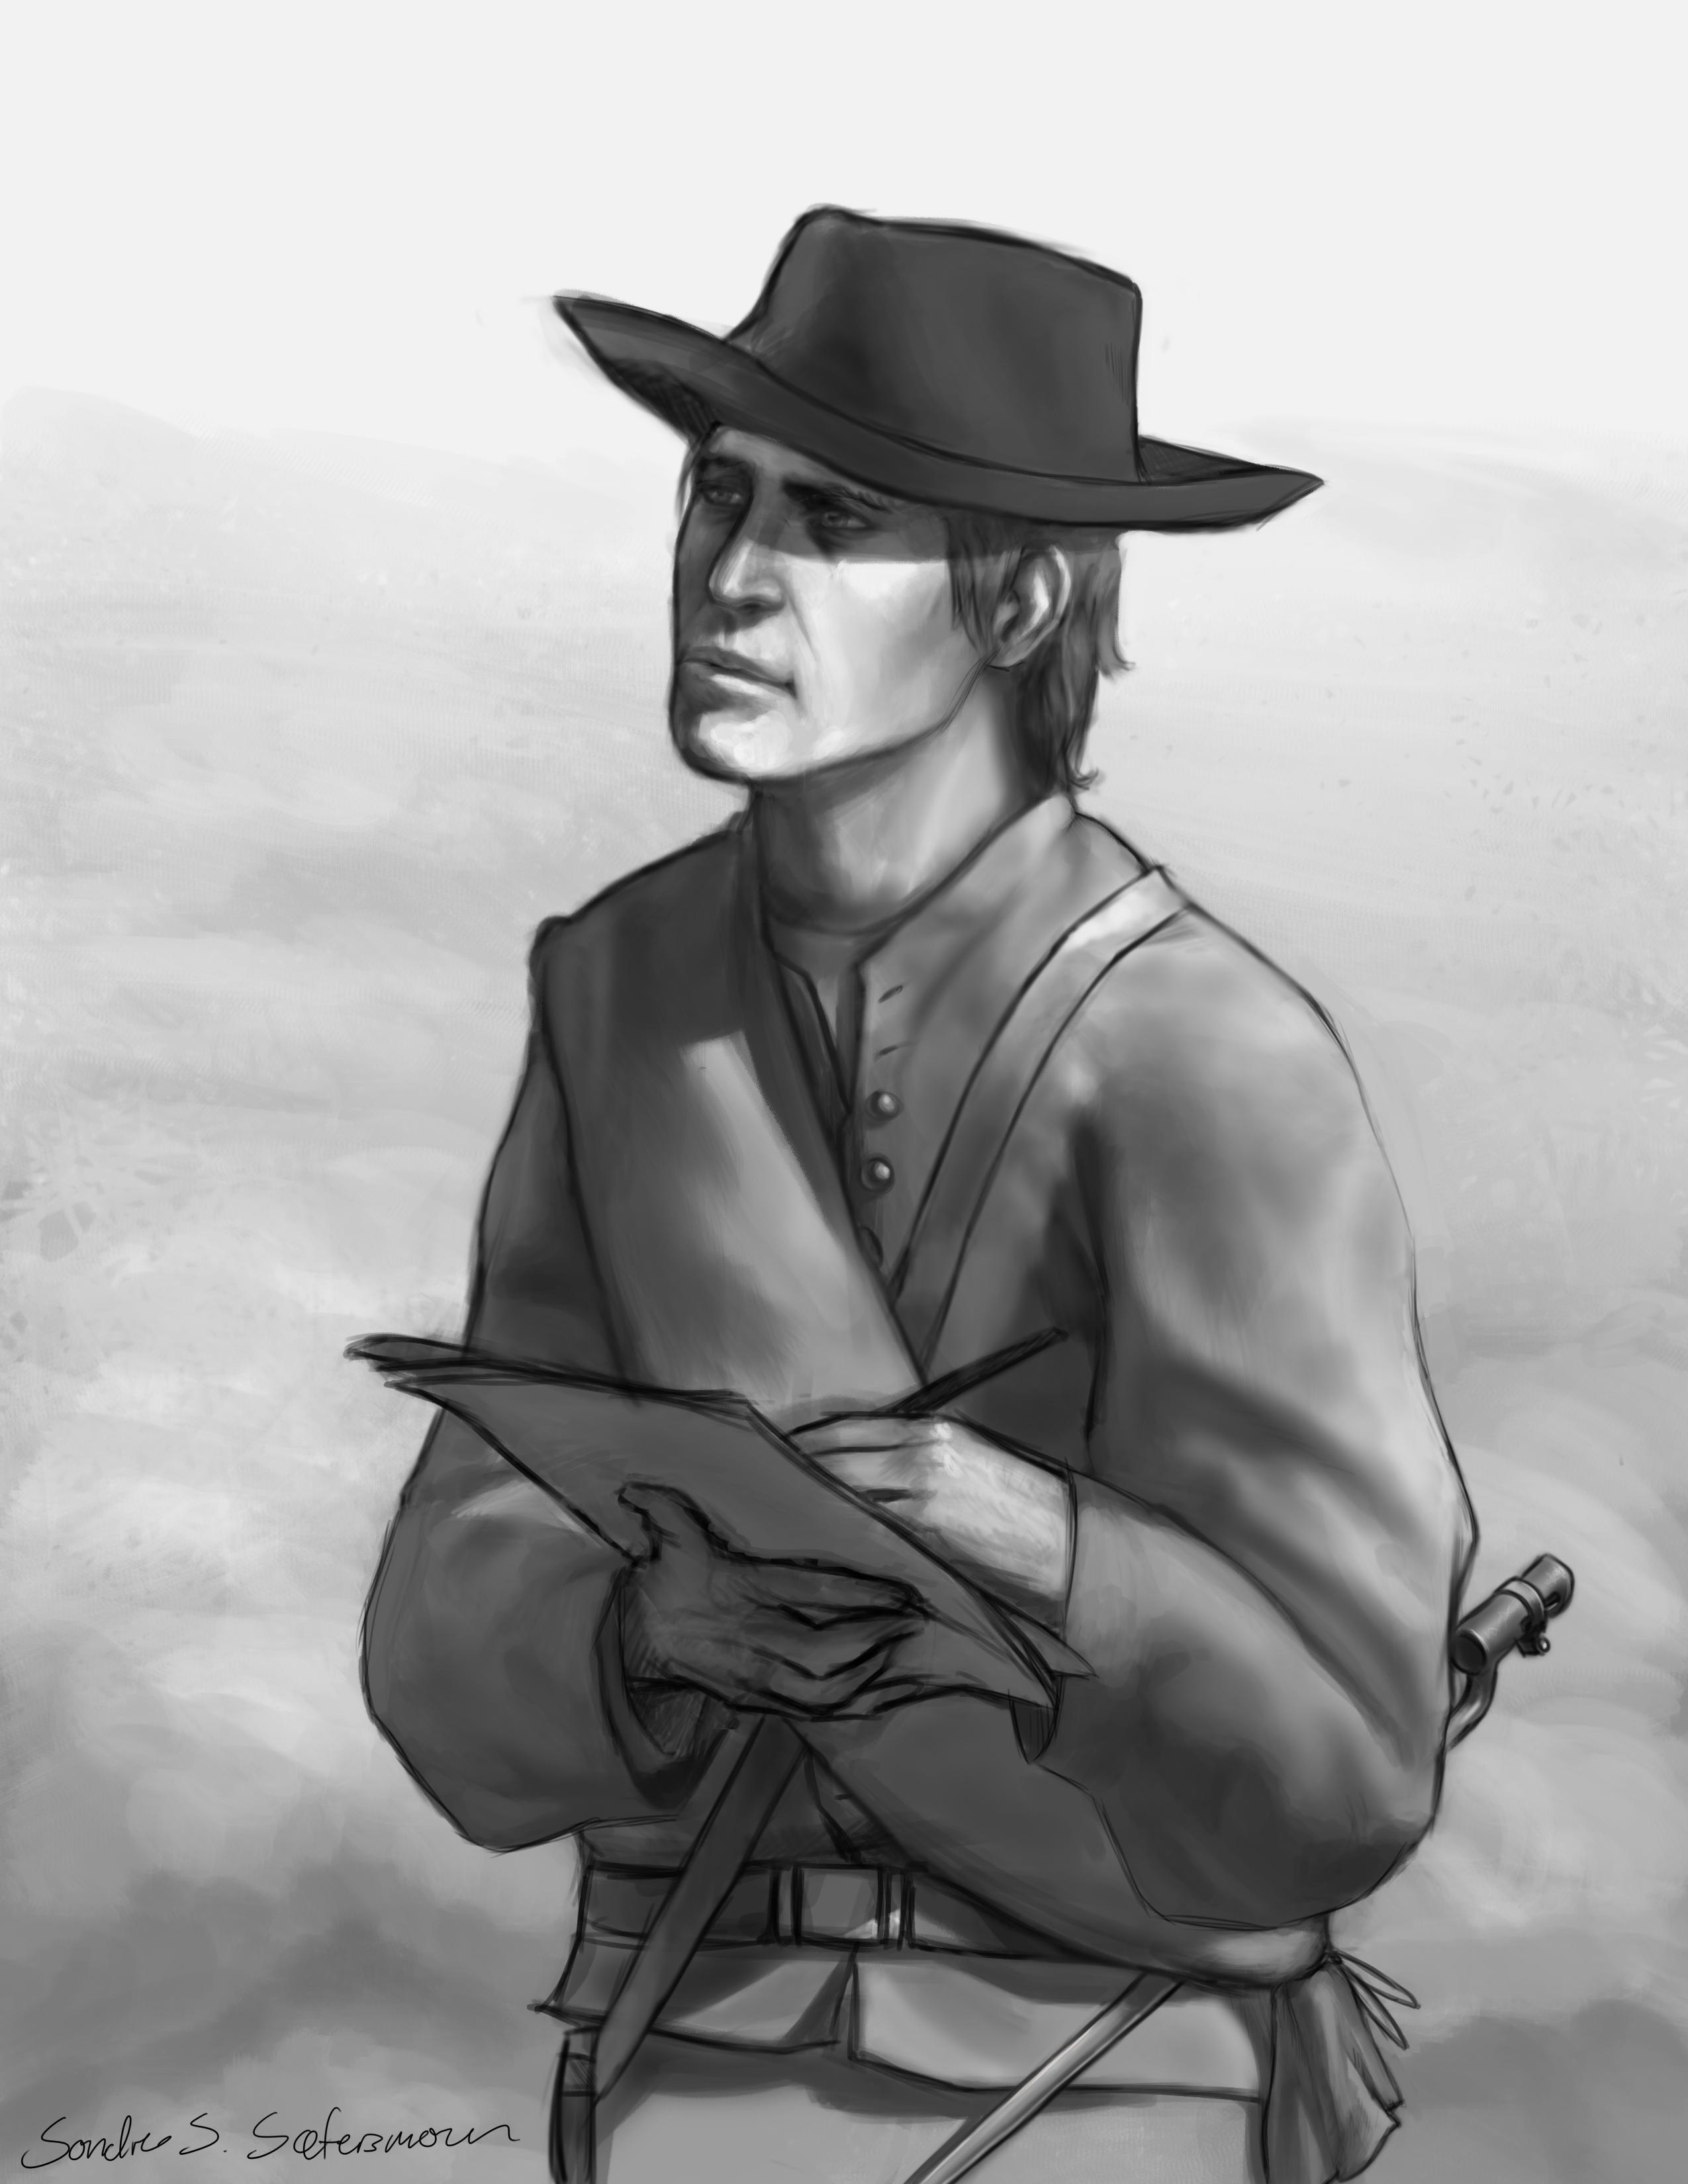 (Blacknwhite) Confederate frontline artist